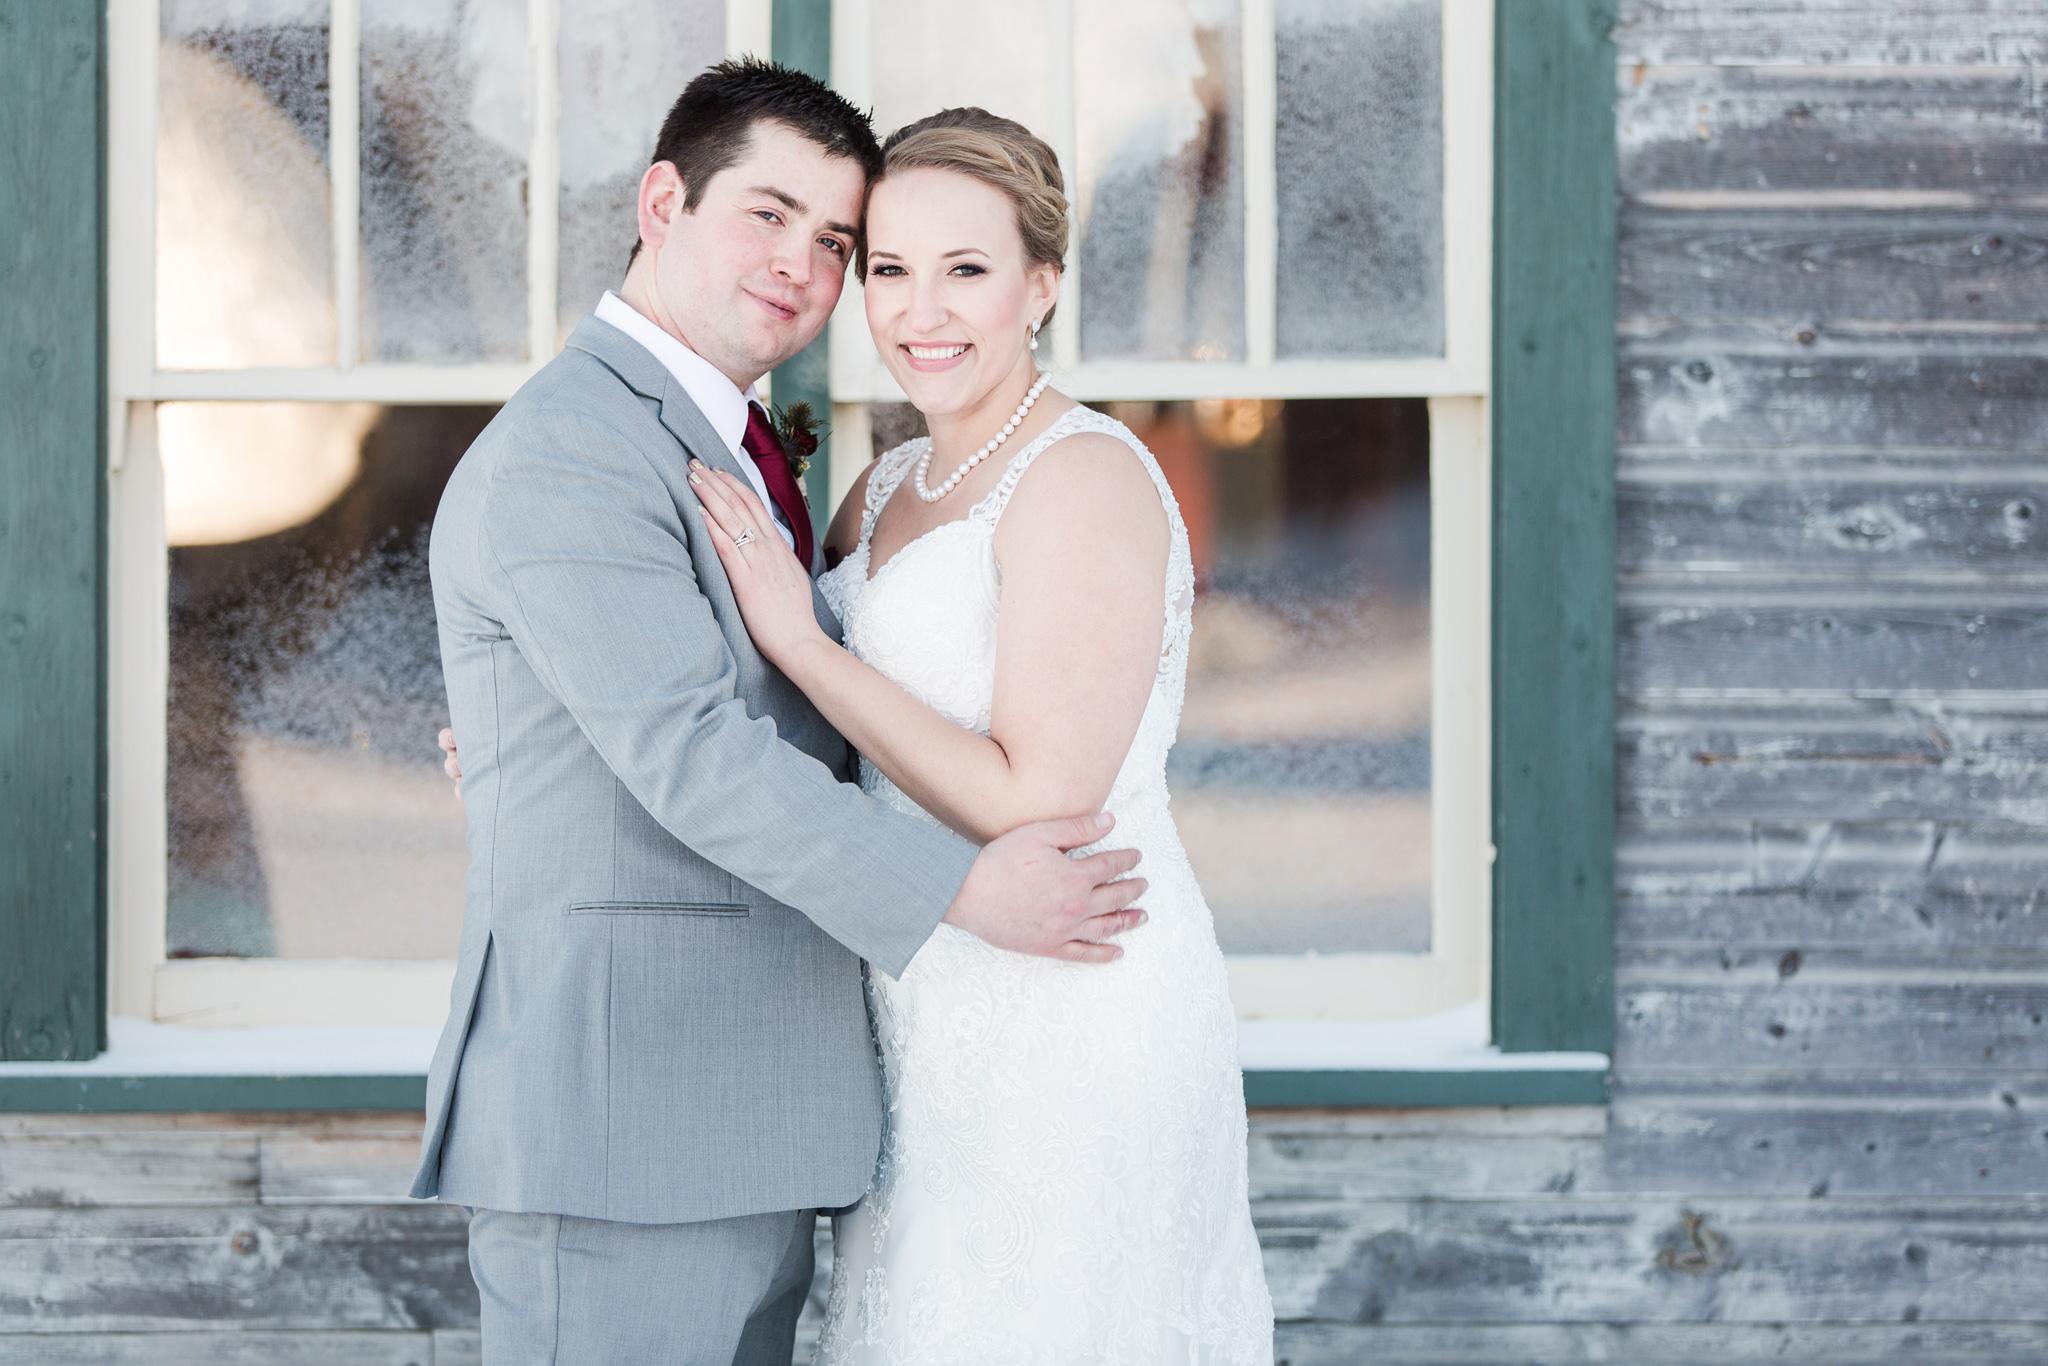 Laura & Jamie - New Years Eve Wedding - Olson Studios